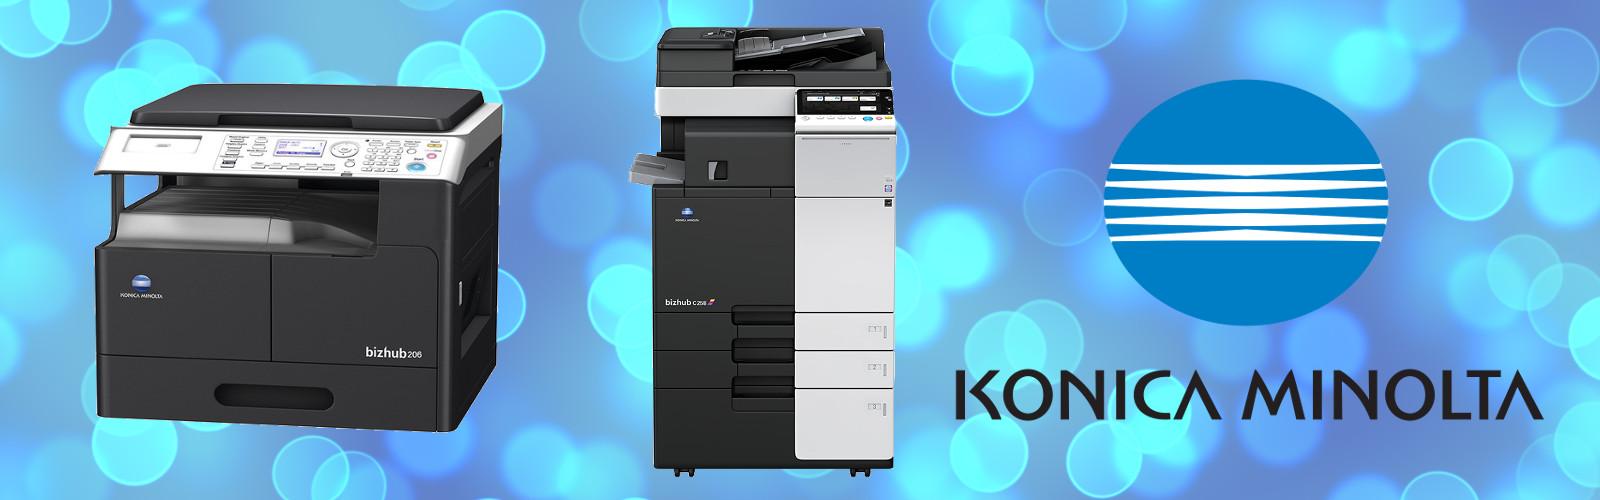 konica-minolta-printers